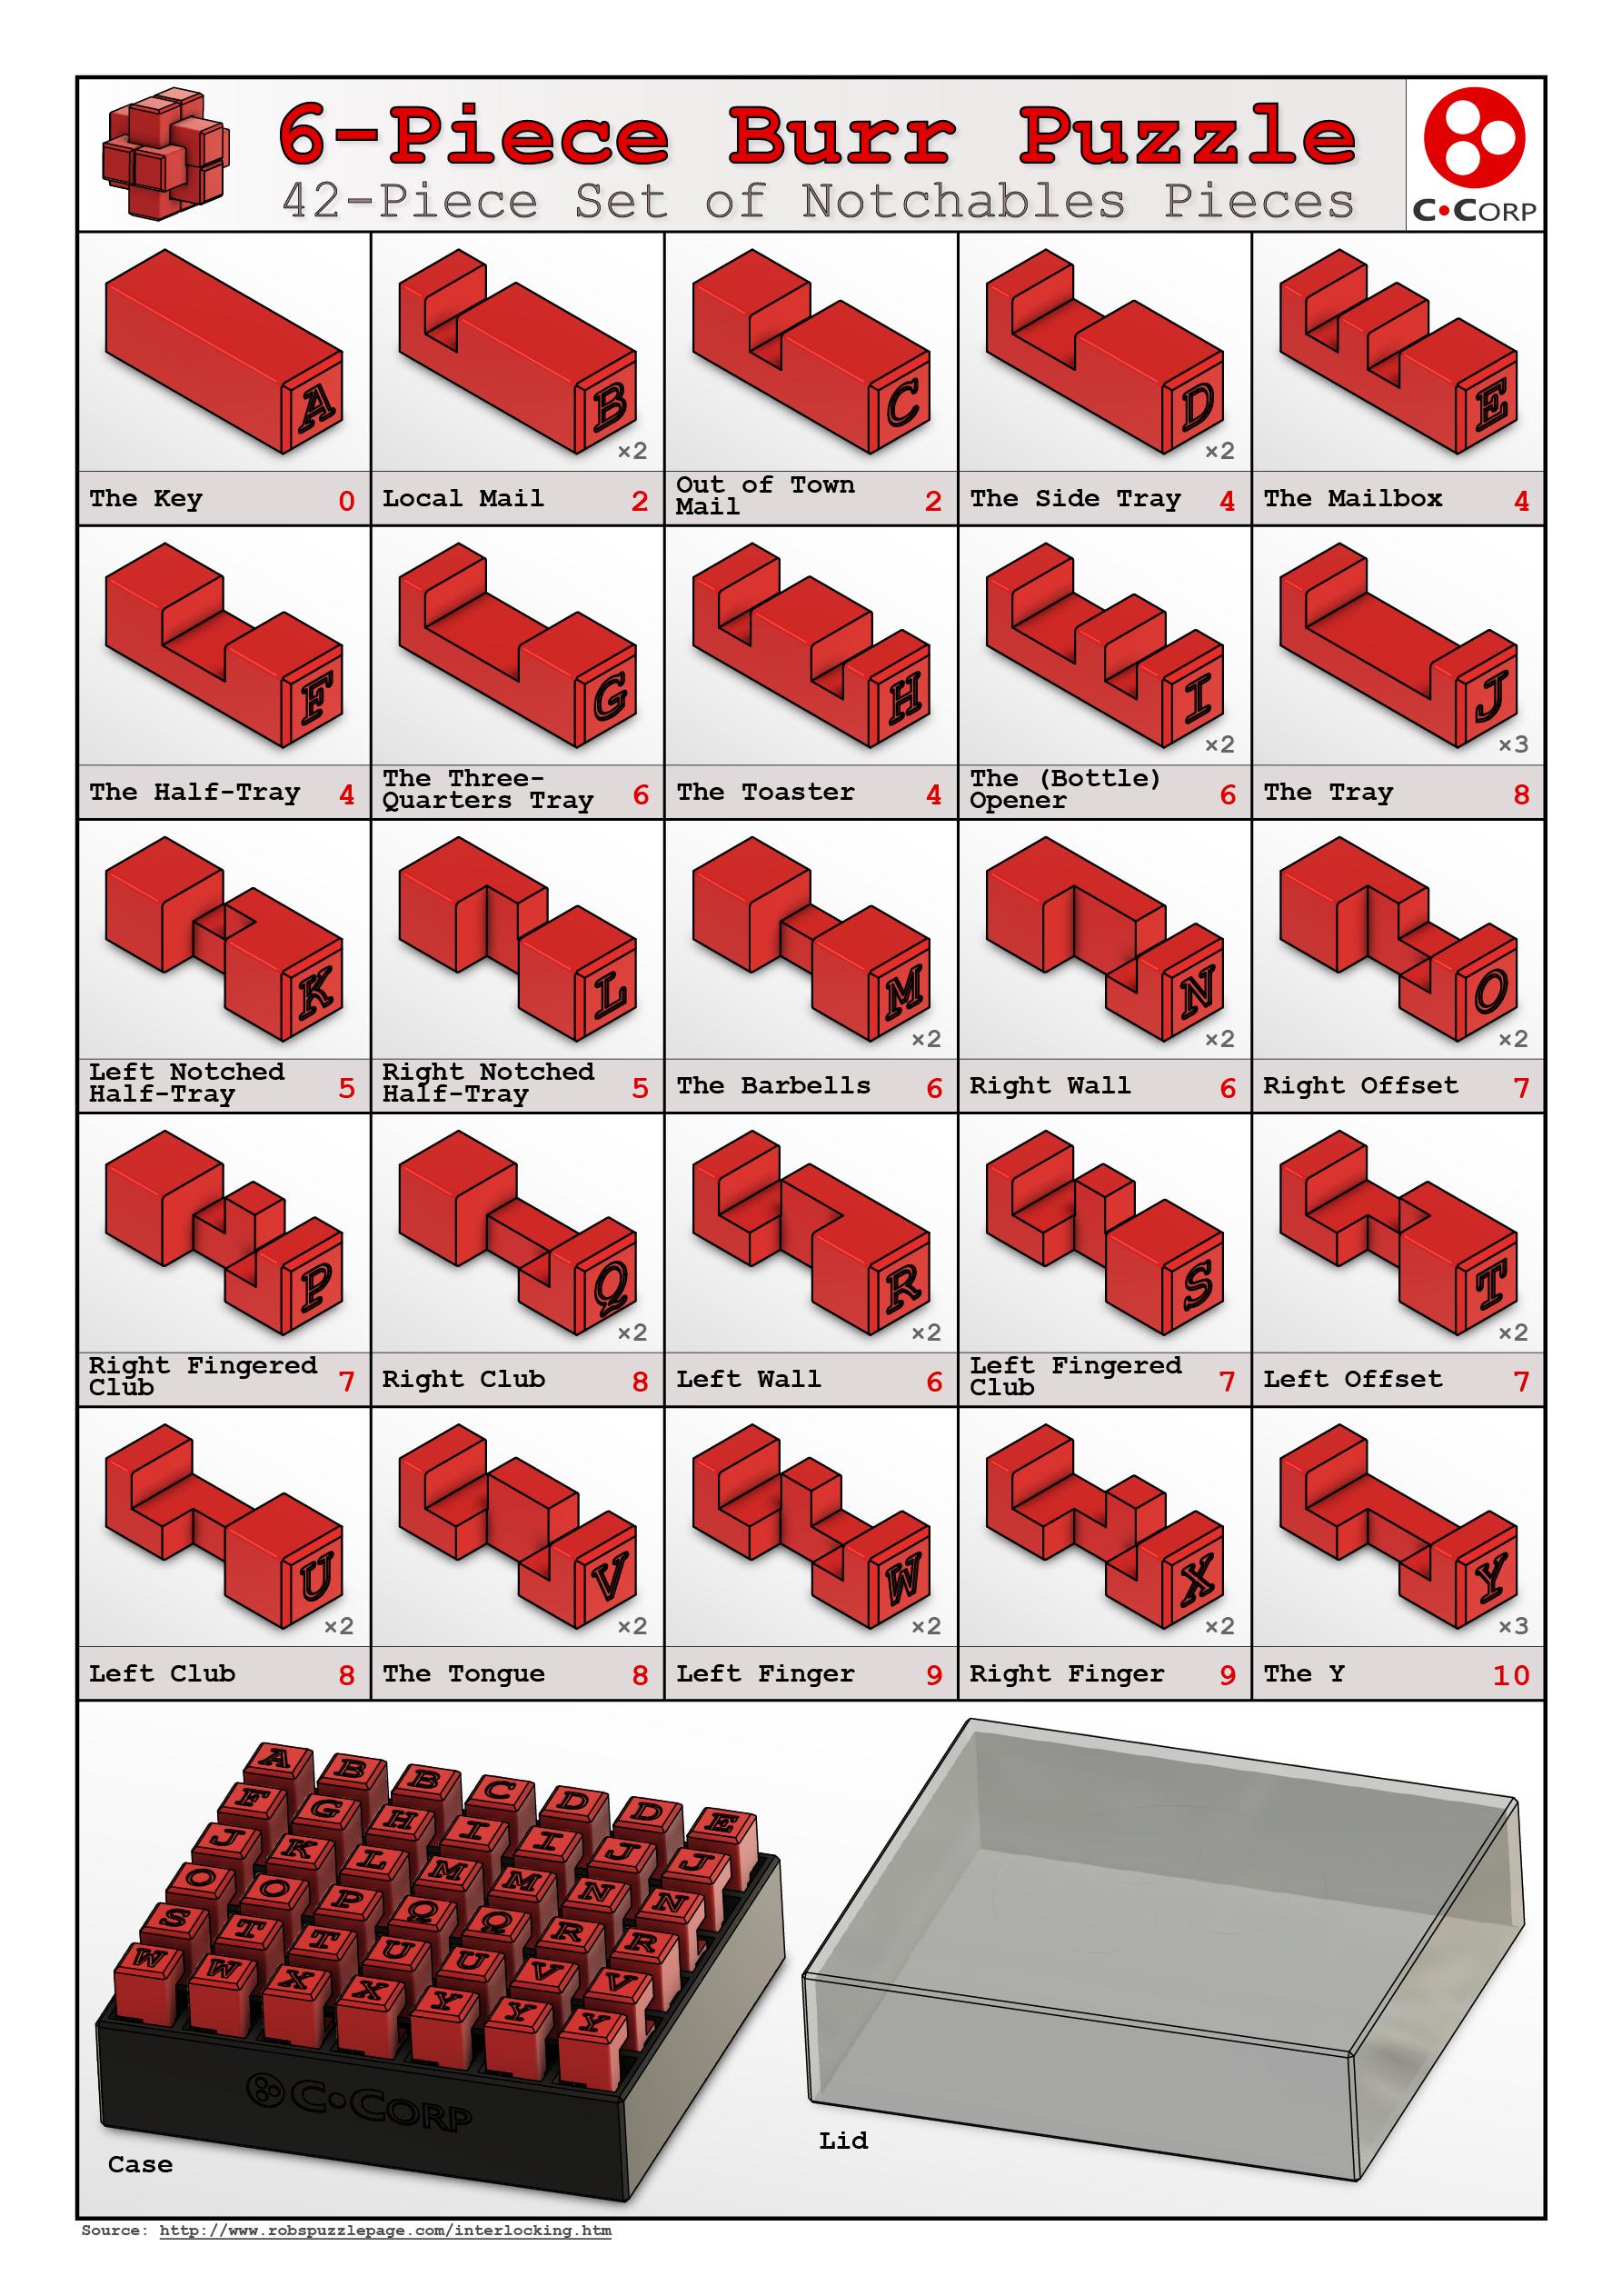 Burr_Page2.png Download free STL file 6-Piece Burr Puzzle - Set of 42 pieces • 3D printable model, ChampystileCorp